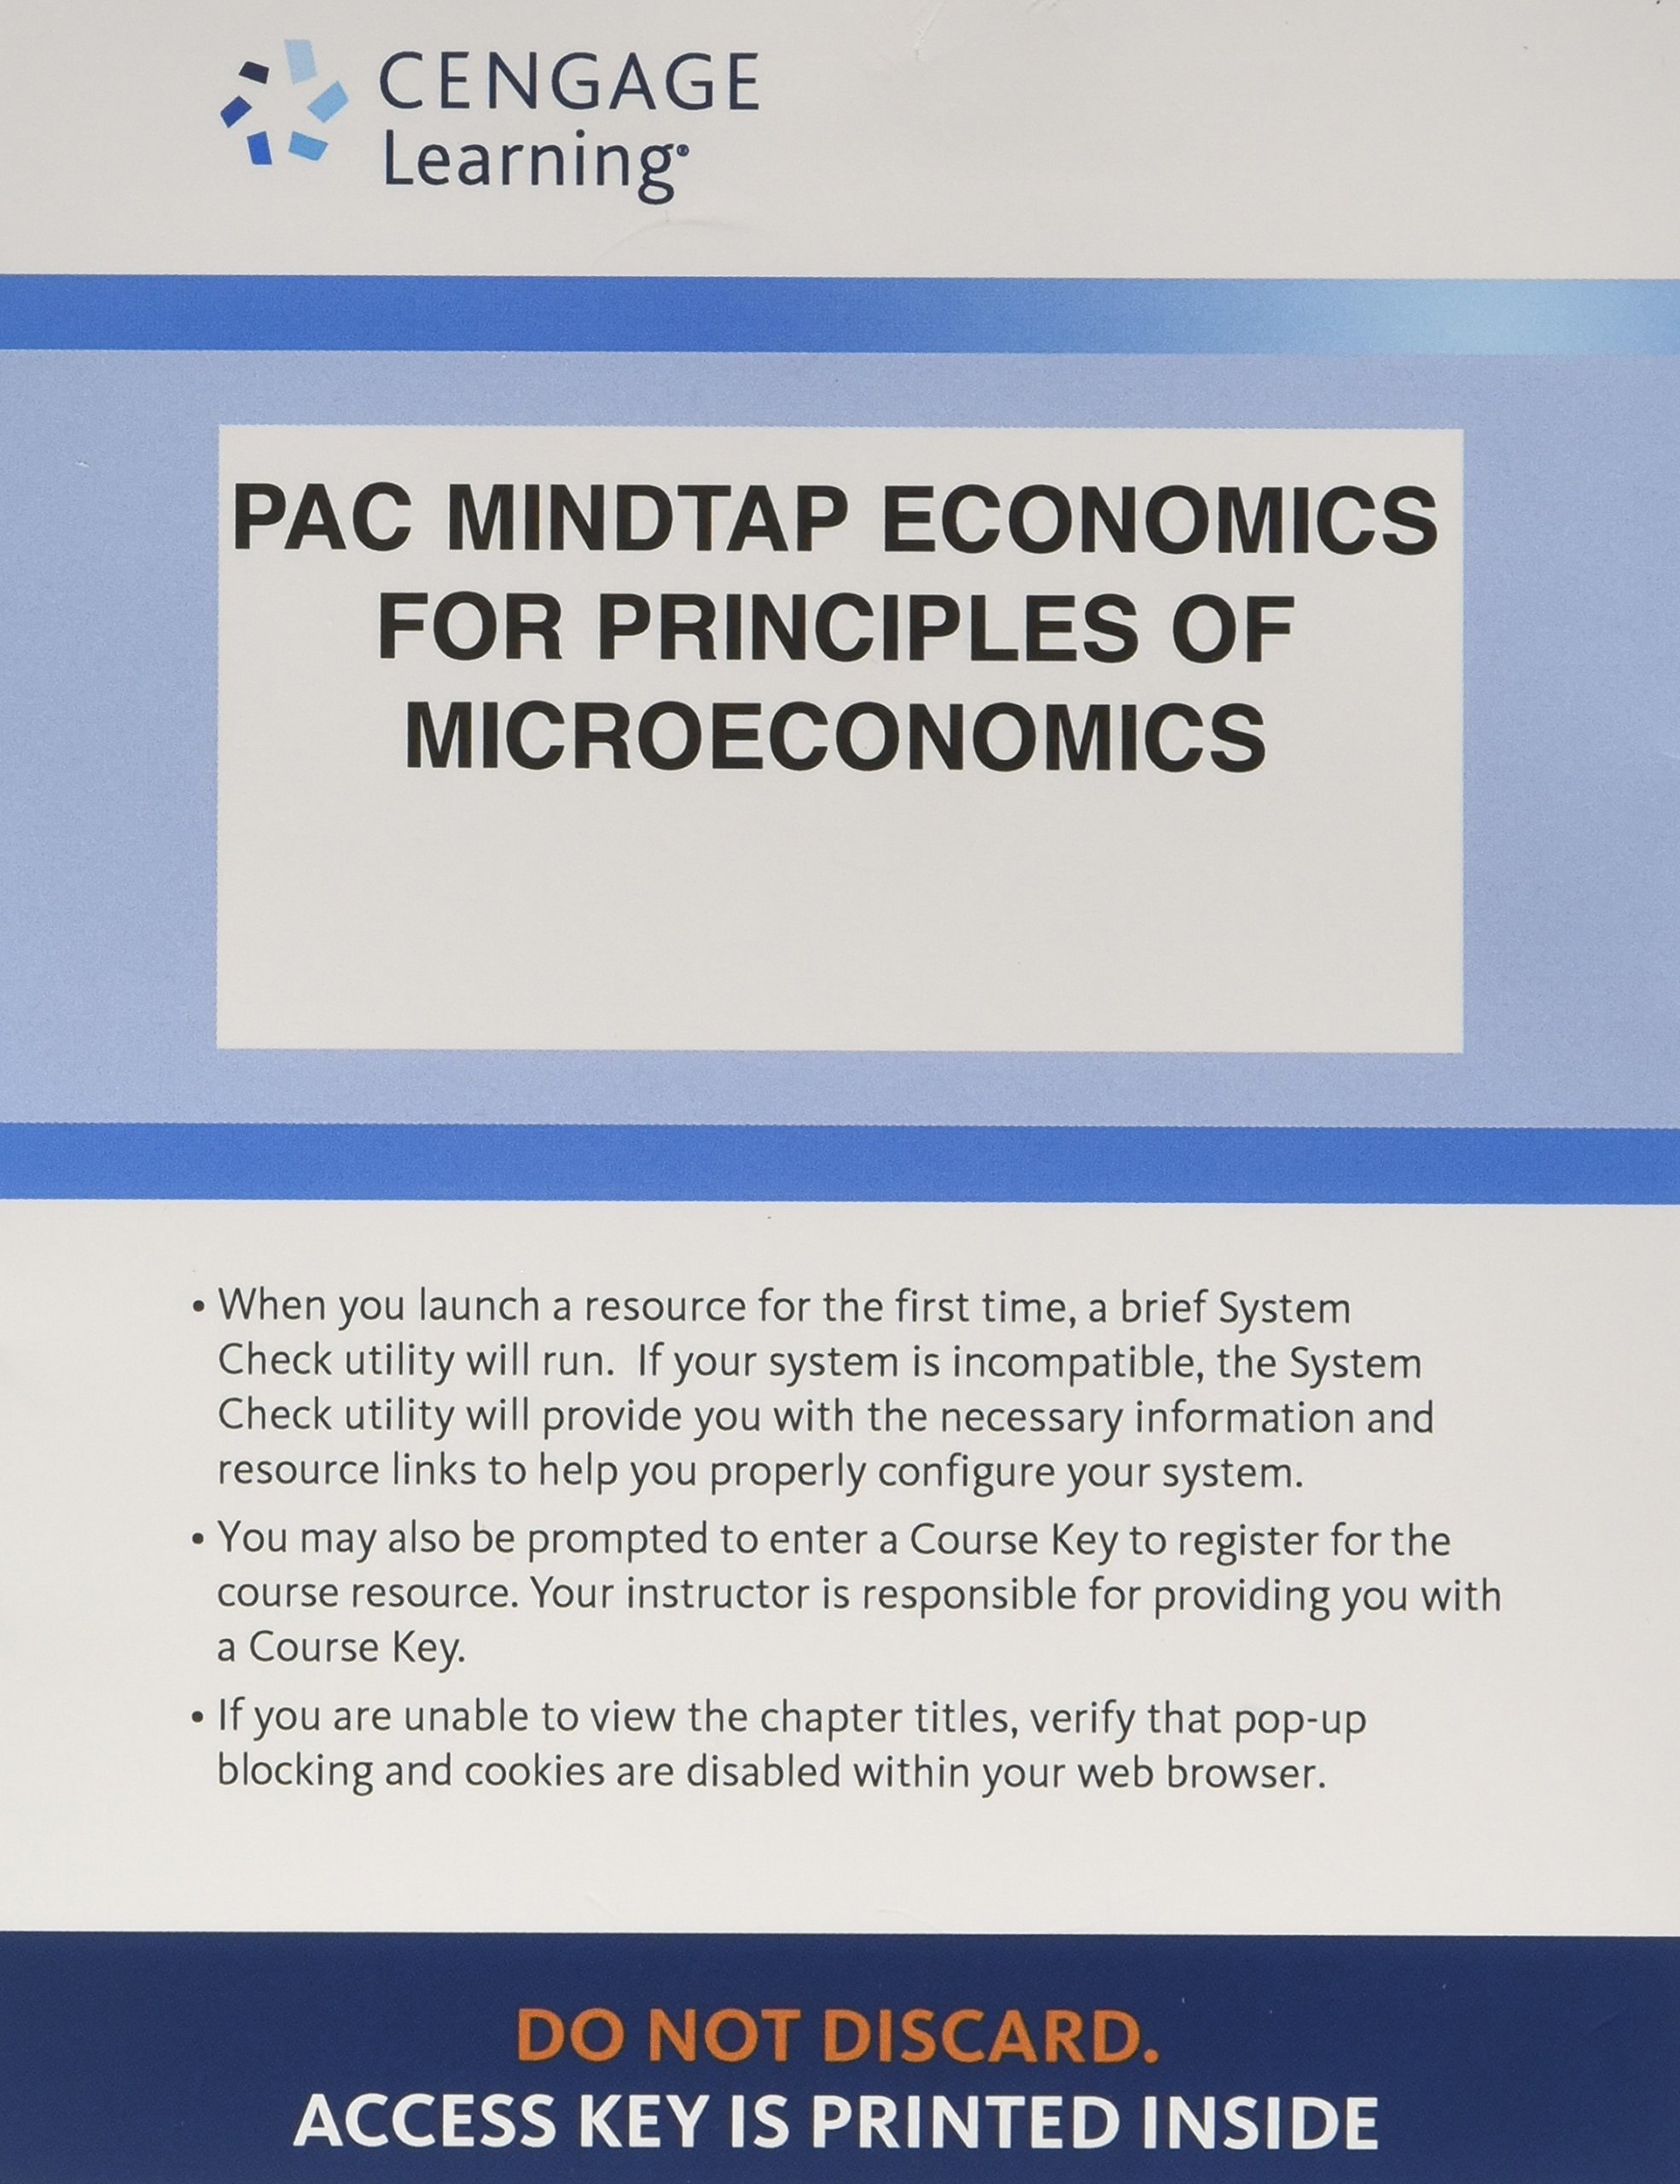 Read Online MindTap Economics, 1 term (6 months) Printed Access Card for Mankiw's Principles of Microeconomics, 7th pdf epub